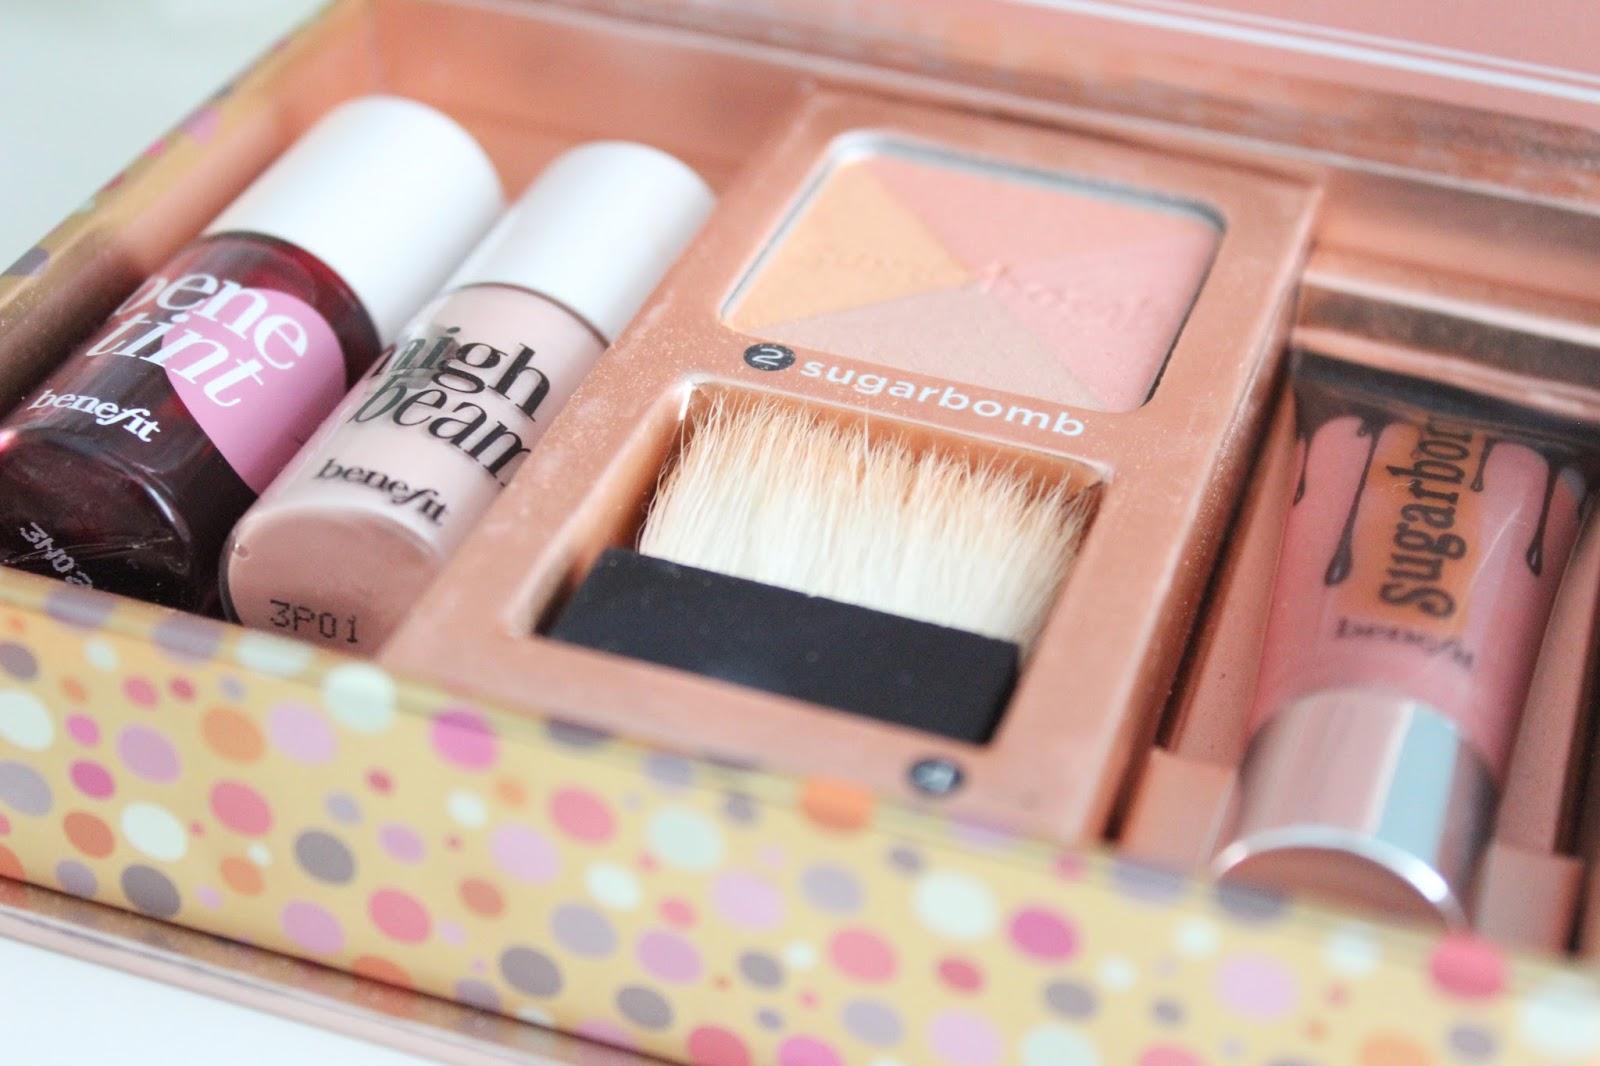 Sugarlicious Deliciously Nude Lip & Cheek Kit by Benefit #4